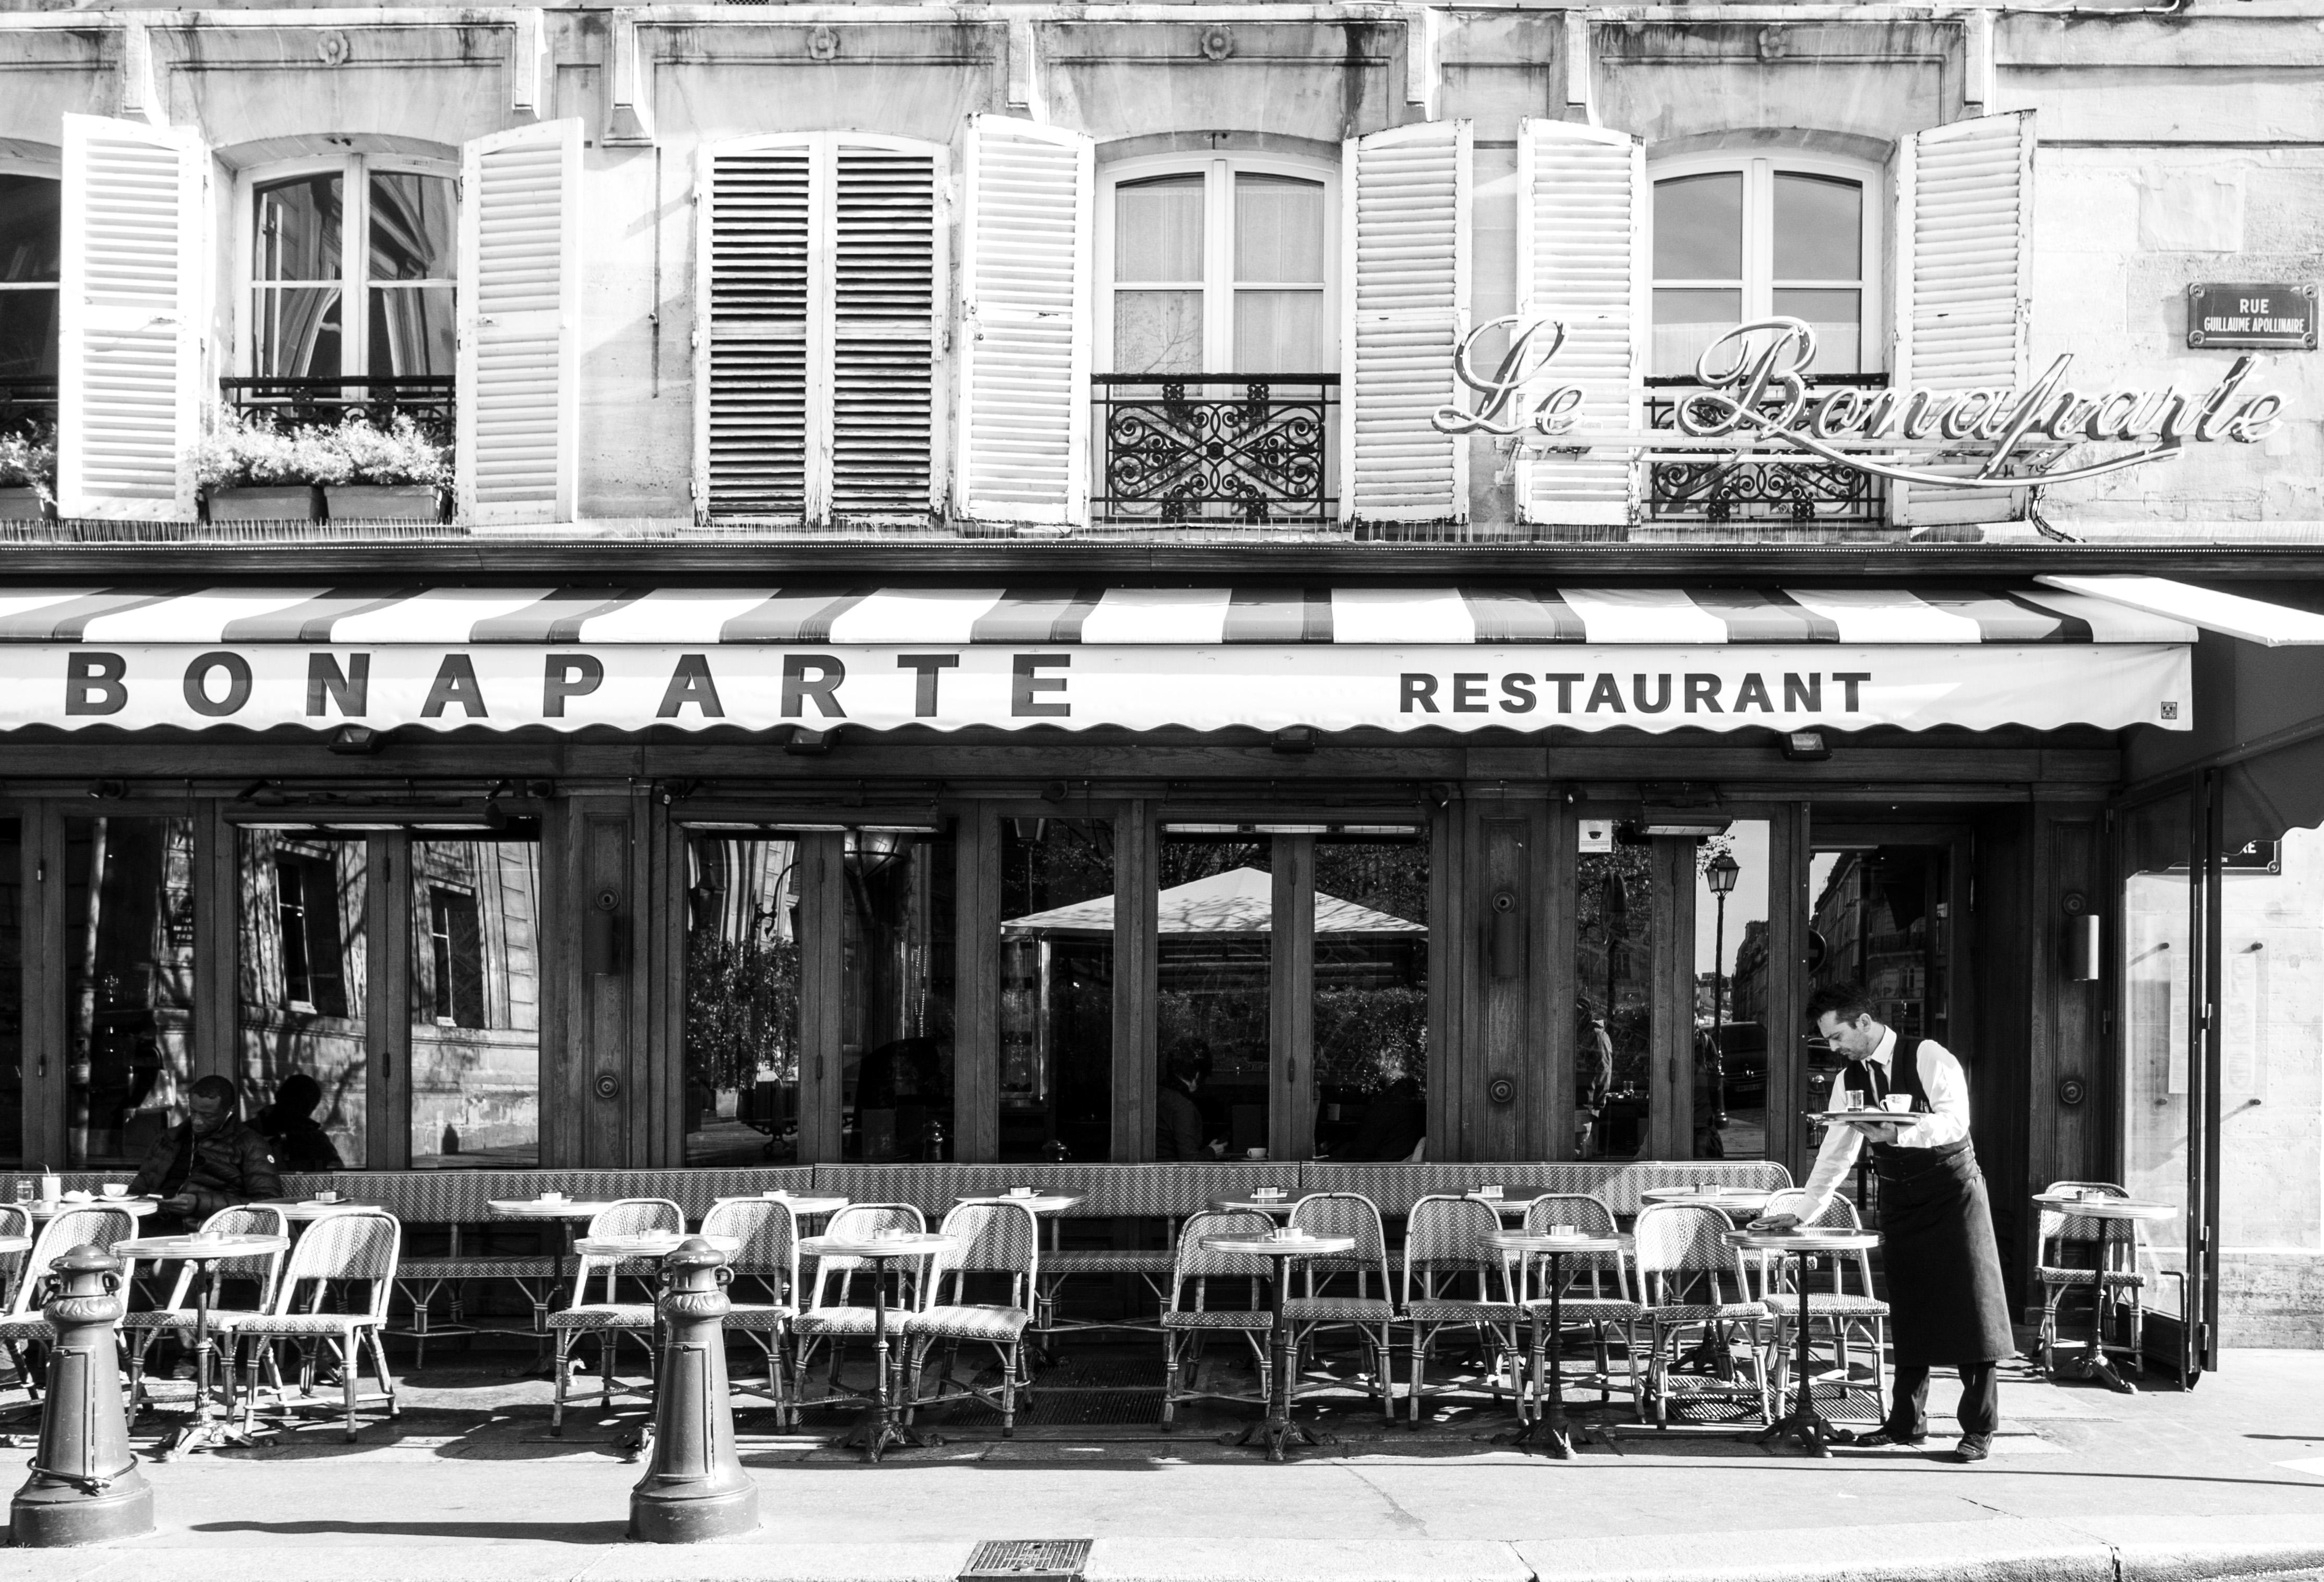 Bien 21 Rue Bonaparte 75006 Paris #13: File:Le Bonaparte, 42 Rue Bonaparte, 75006 Paris, France November 2016.